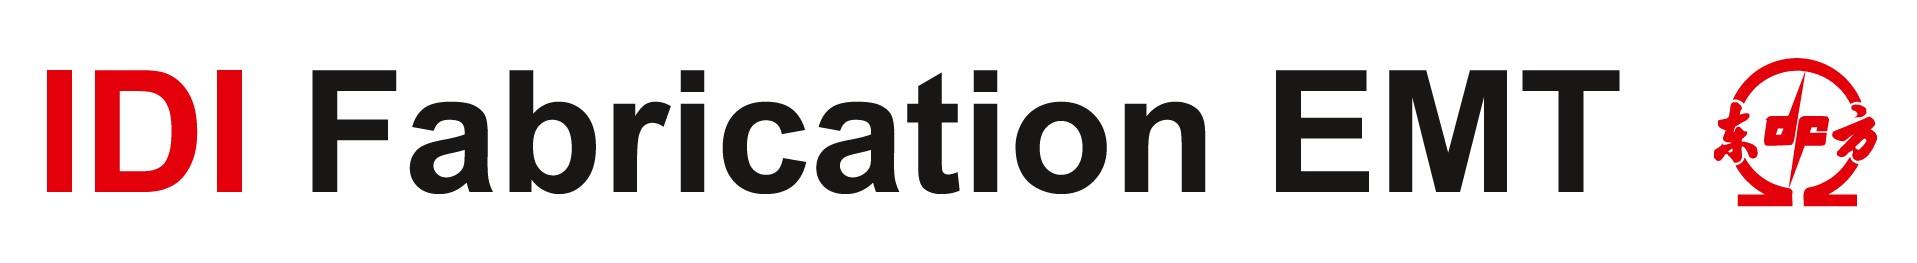 IDI Fabrication EMT